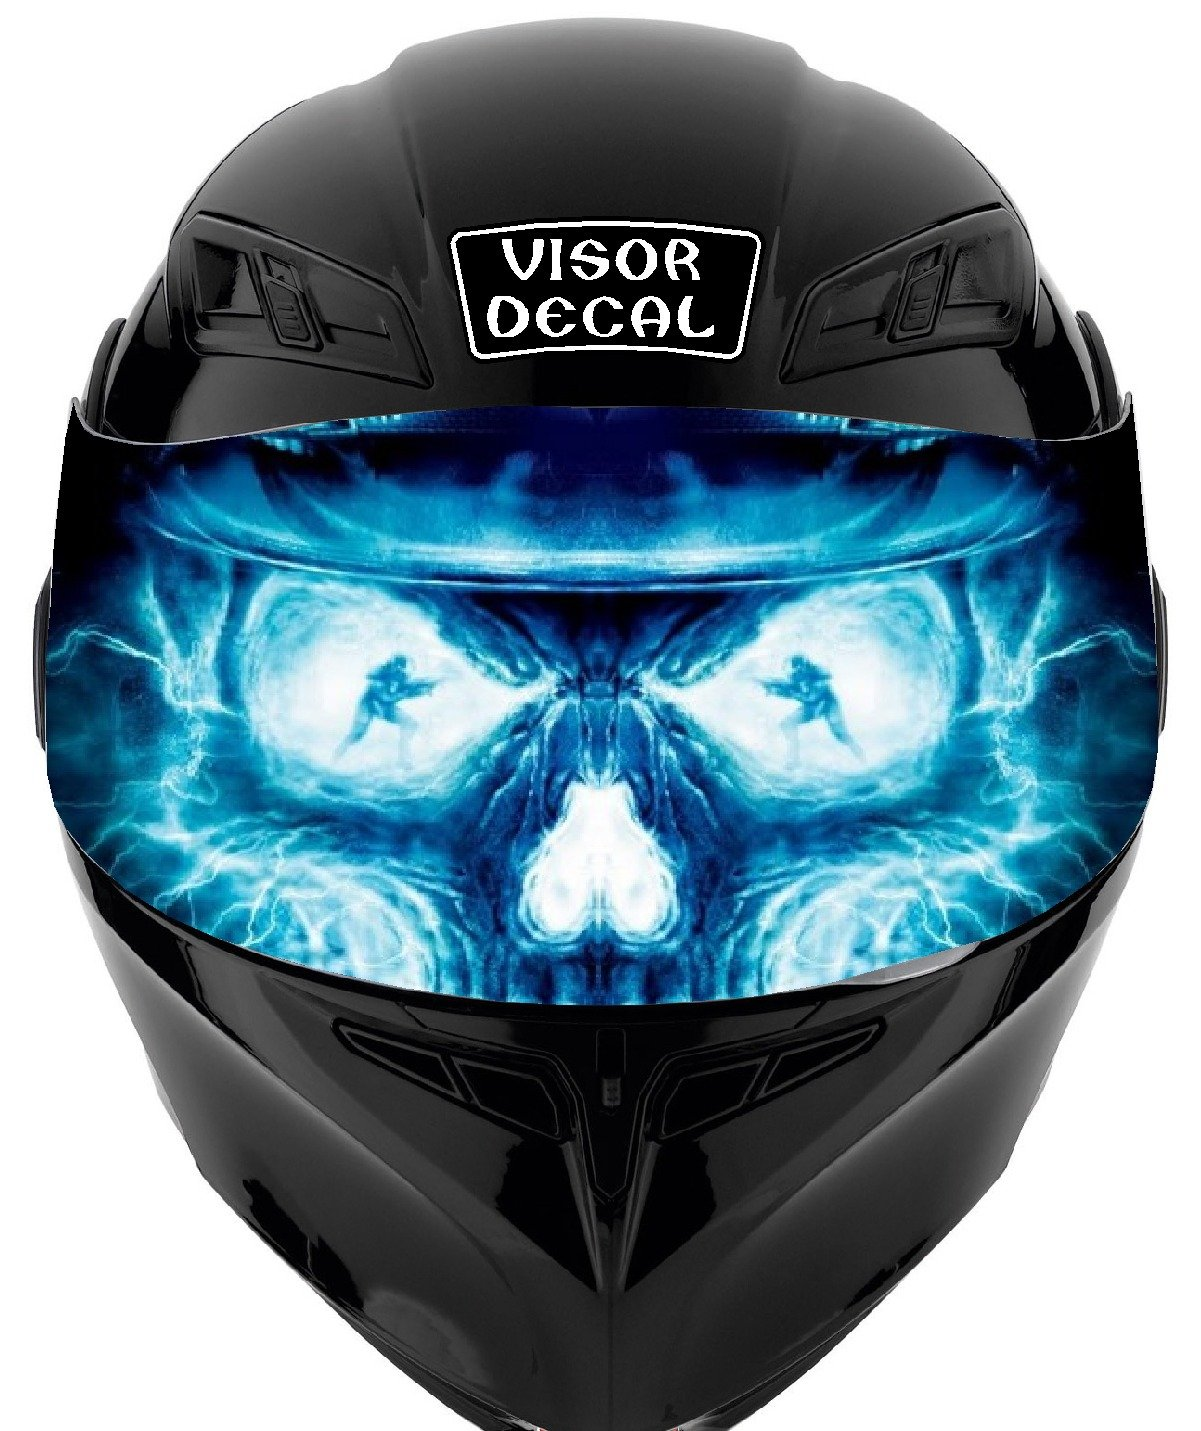 V32 Skull Flames VISOR TINT DECAL Graphic Sticker Helmet Fits: Icon Shoei Bell HJC Oneal Scorpion AGV